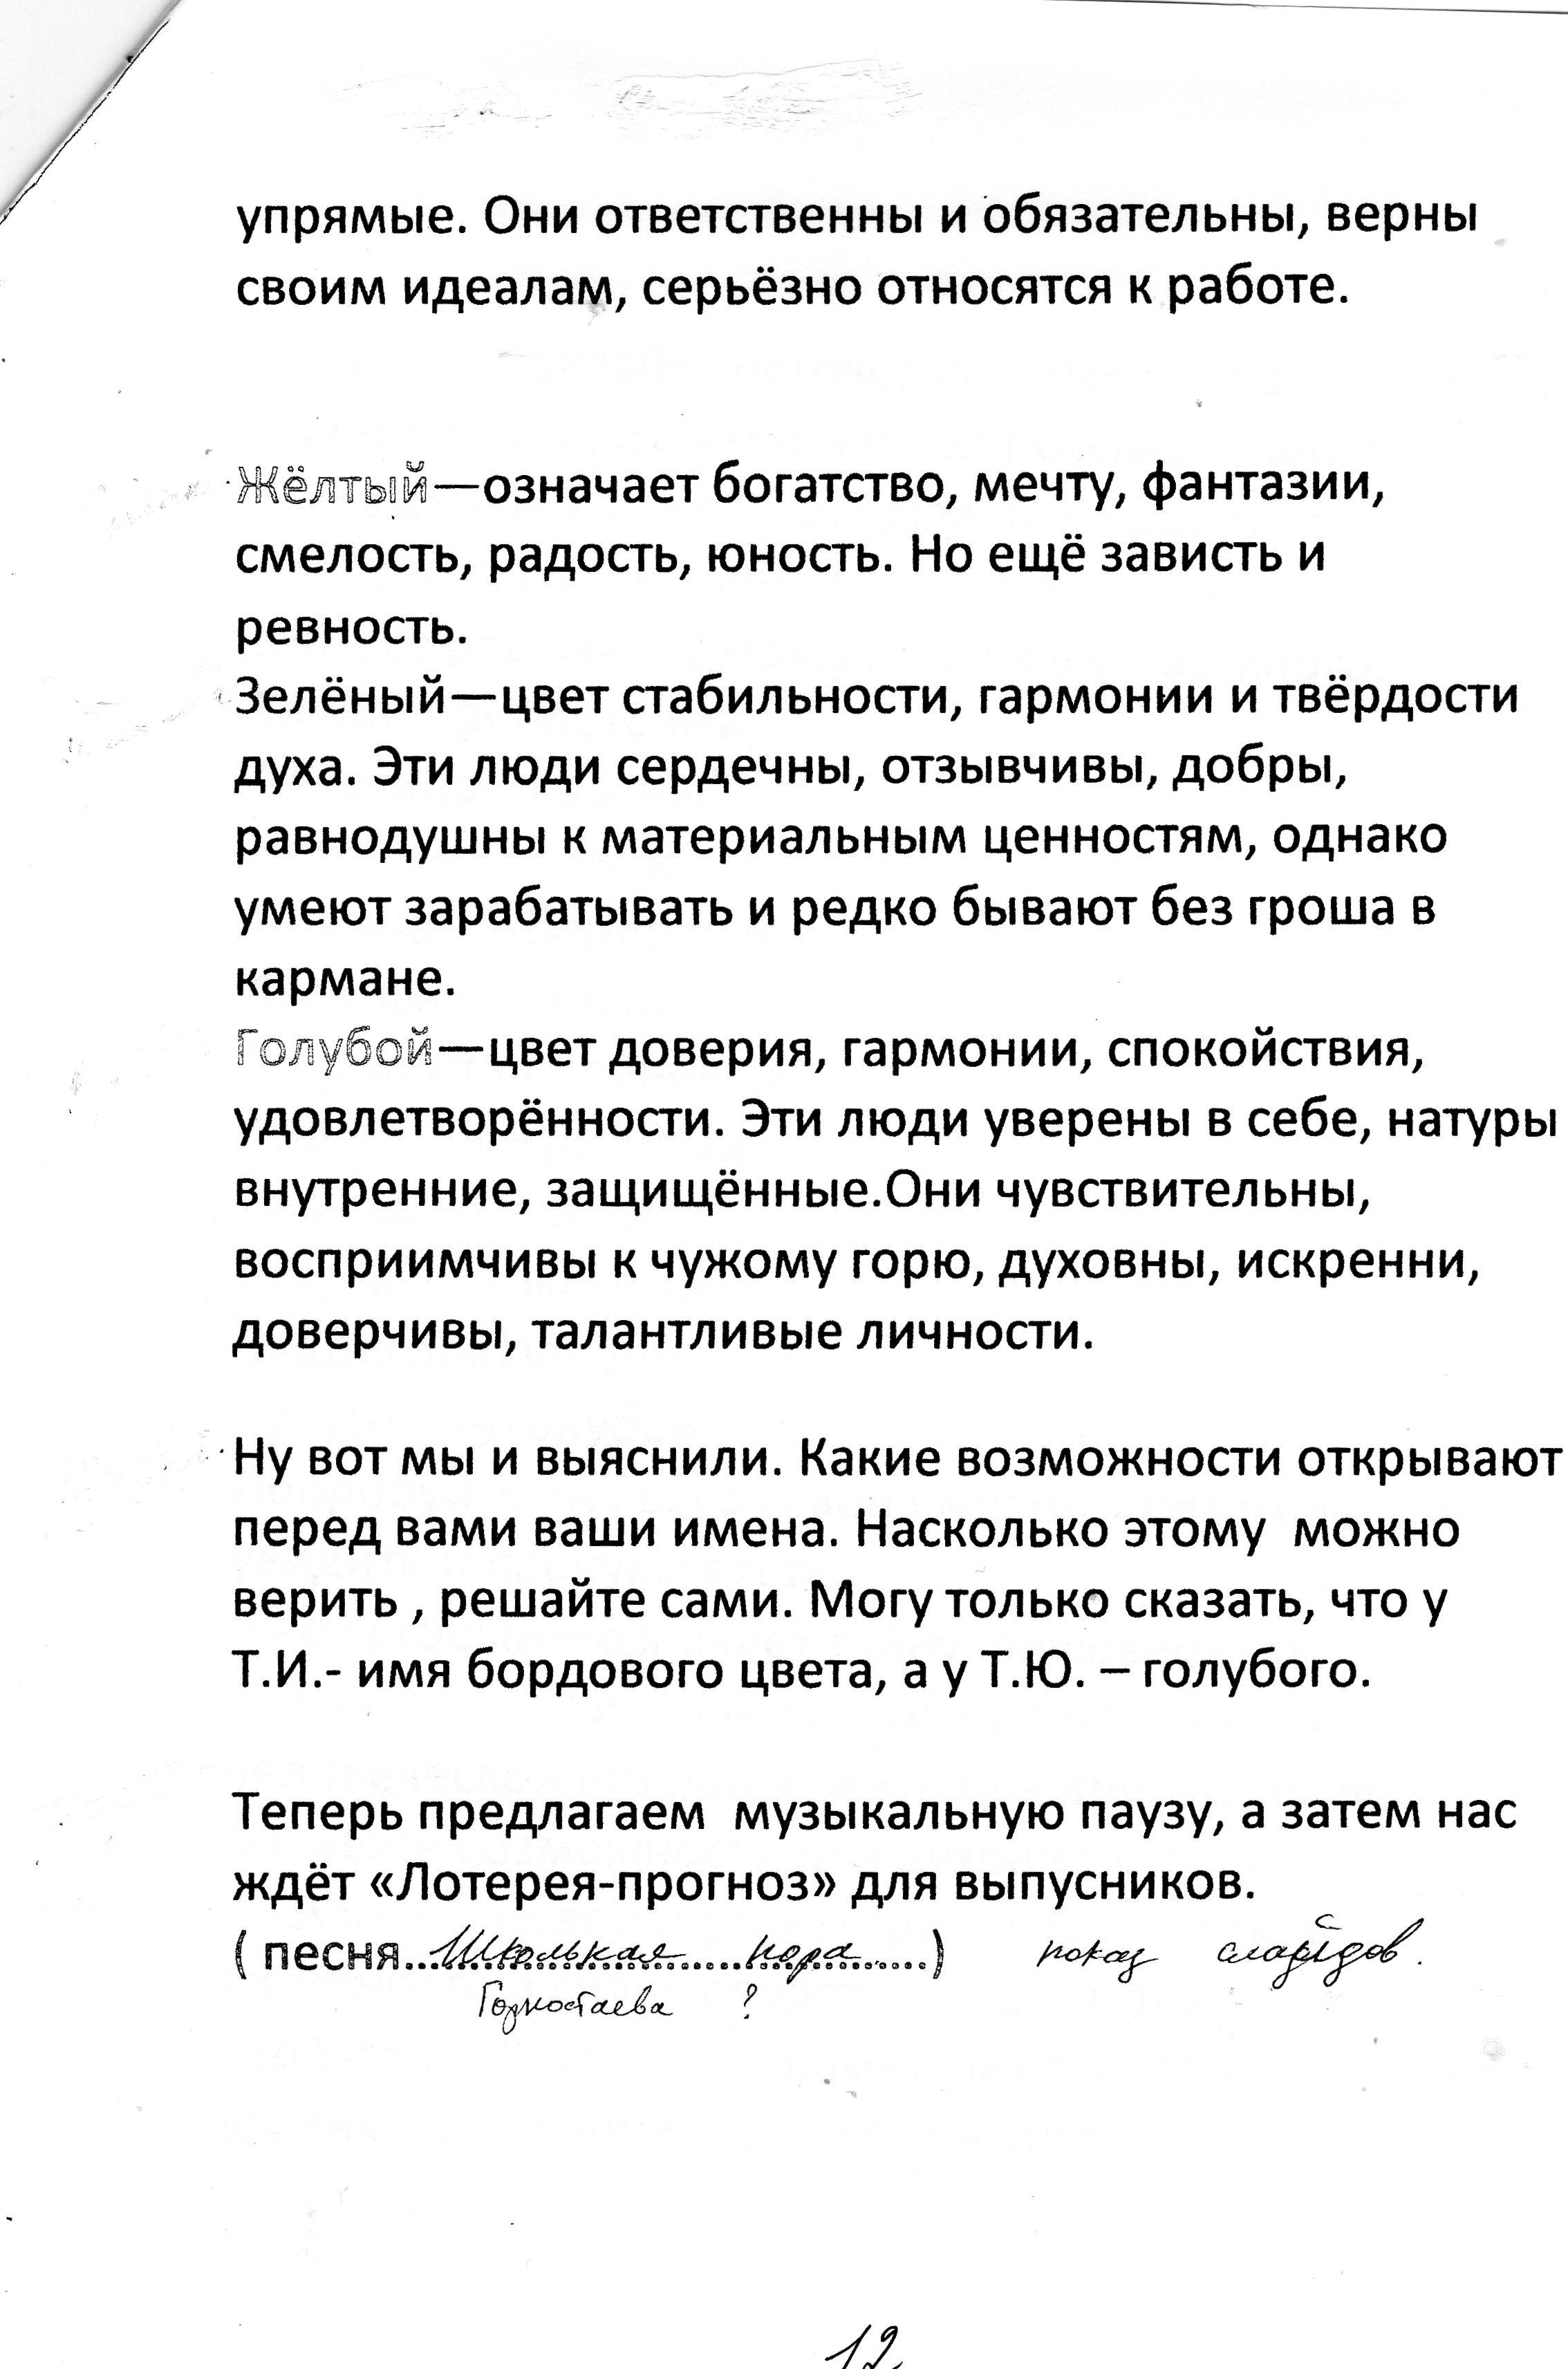 C:\Documents and Settings\ADMIN\Мои документы\9 кл выпускной\img018.jpg